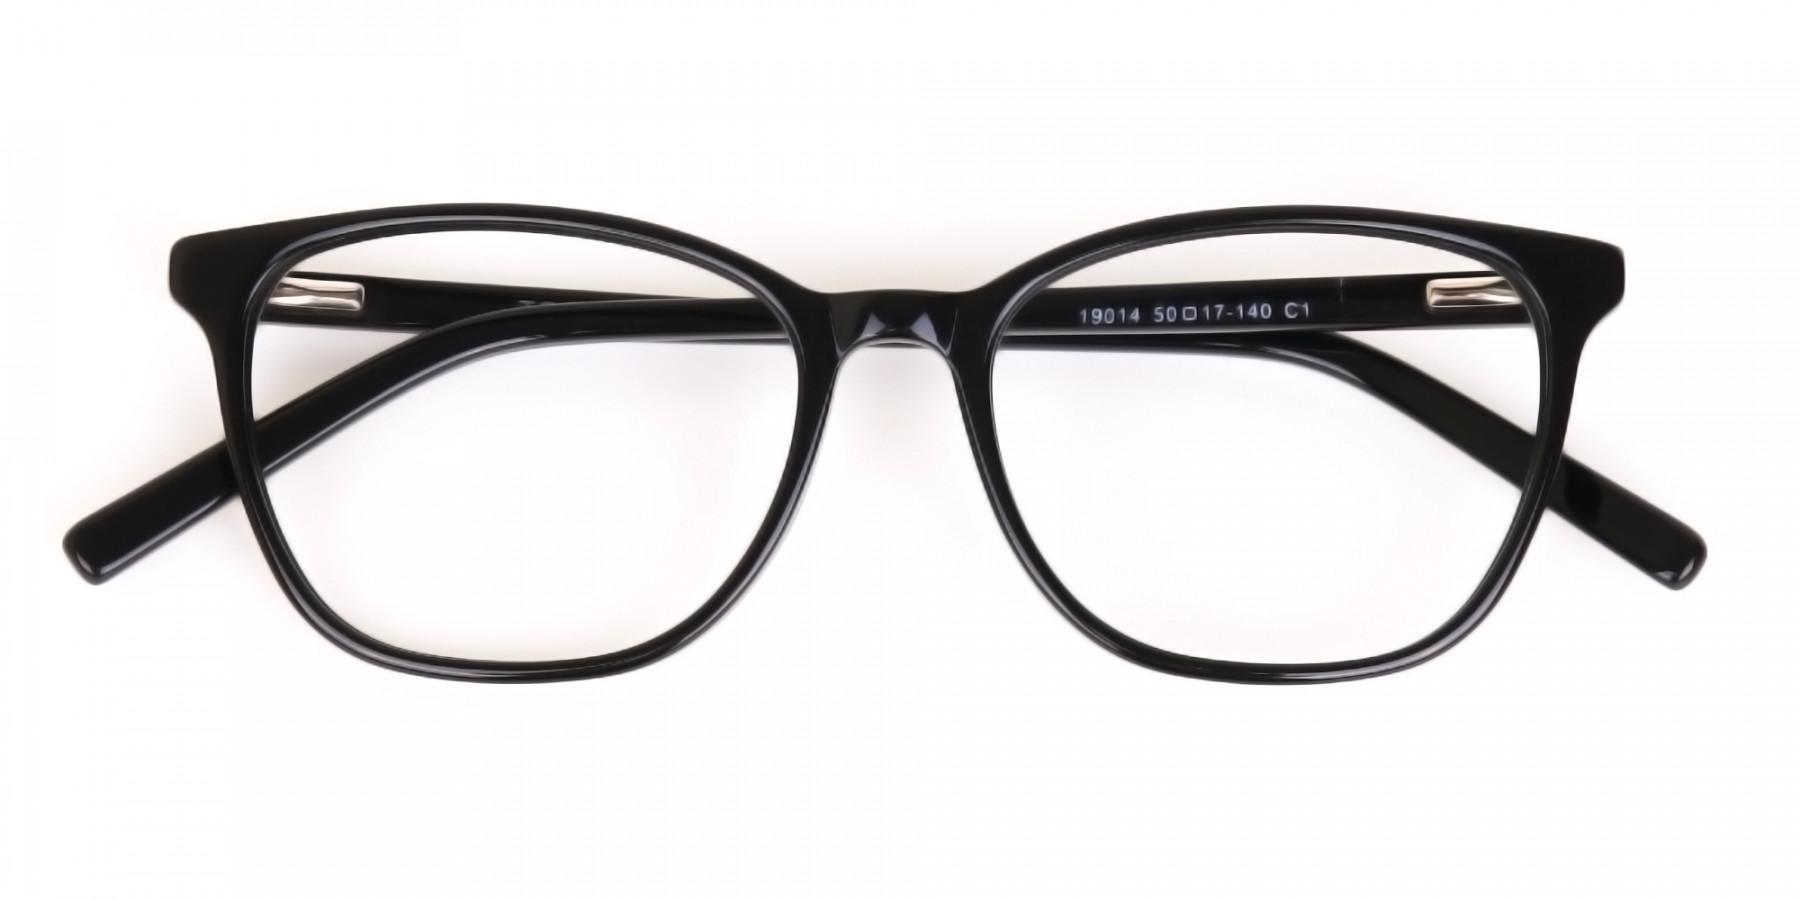 Black Wayfarer Acetate Eyeglasses Unisex-1